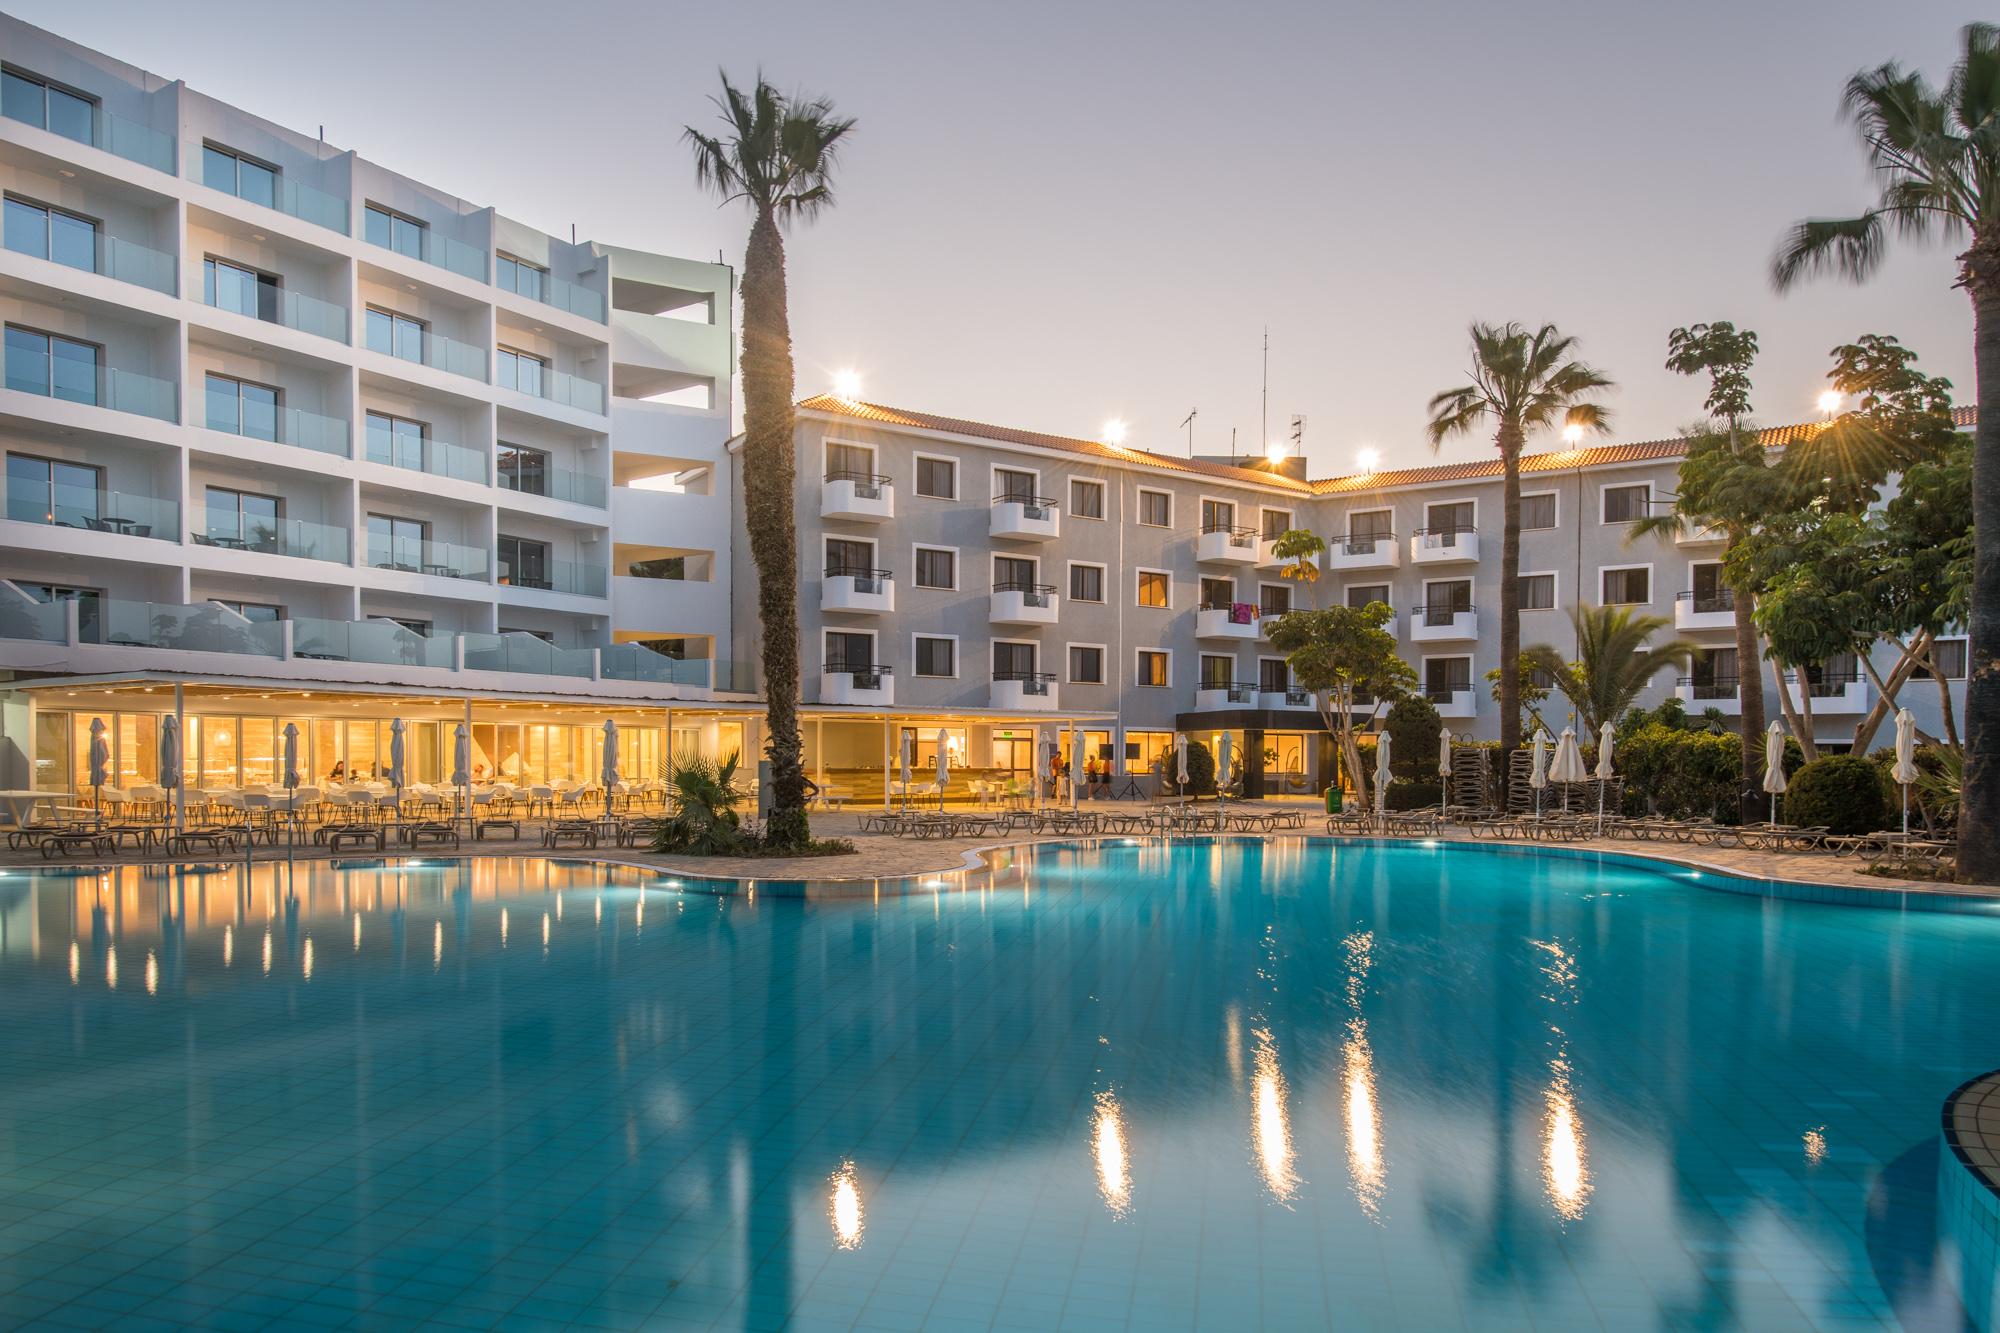 CYPR - LATO 2019: Narcissos Waterpark Resort****, 8 dni (07-14.05.2019 r.), all inclusive: 2379,00 PLN/os. dorosła